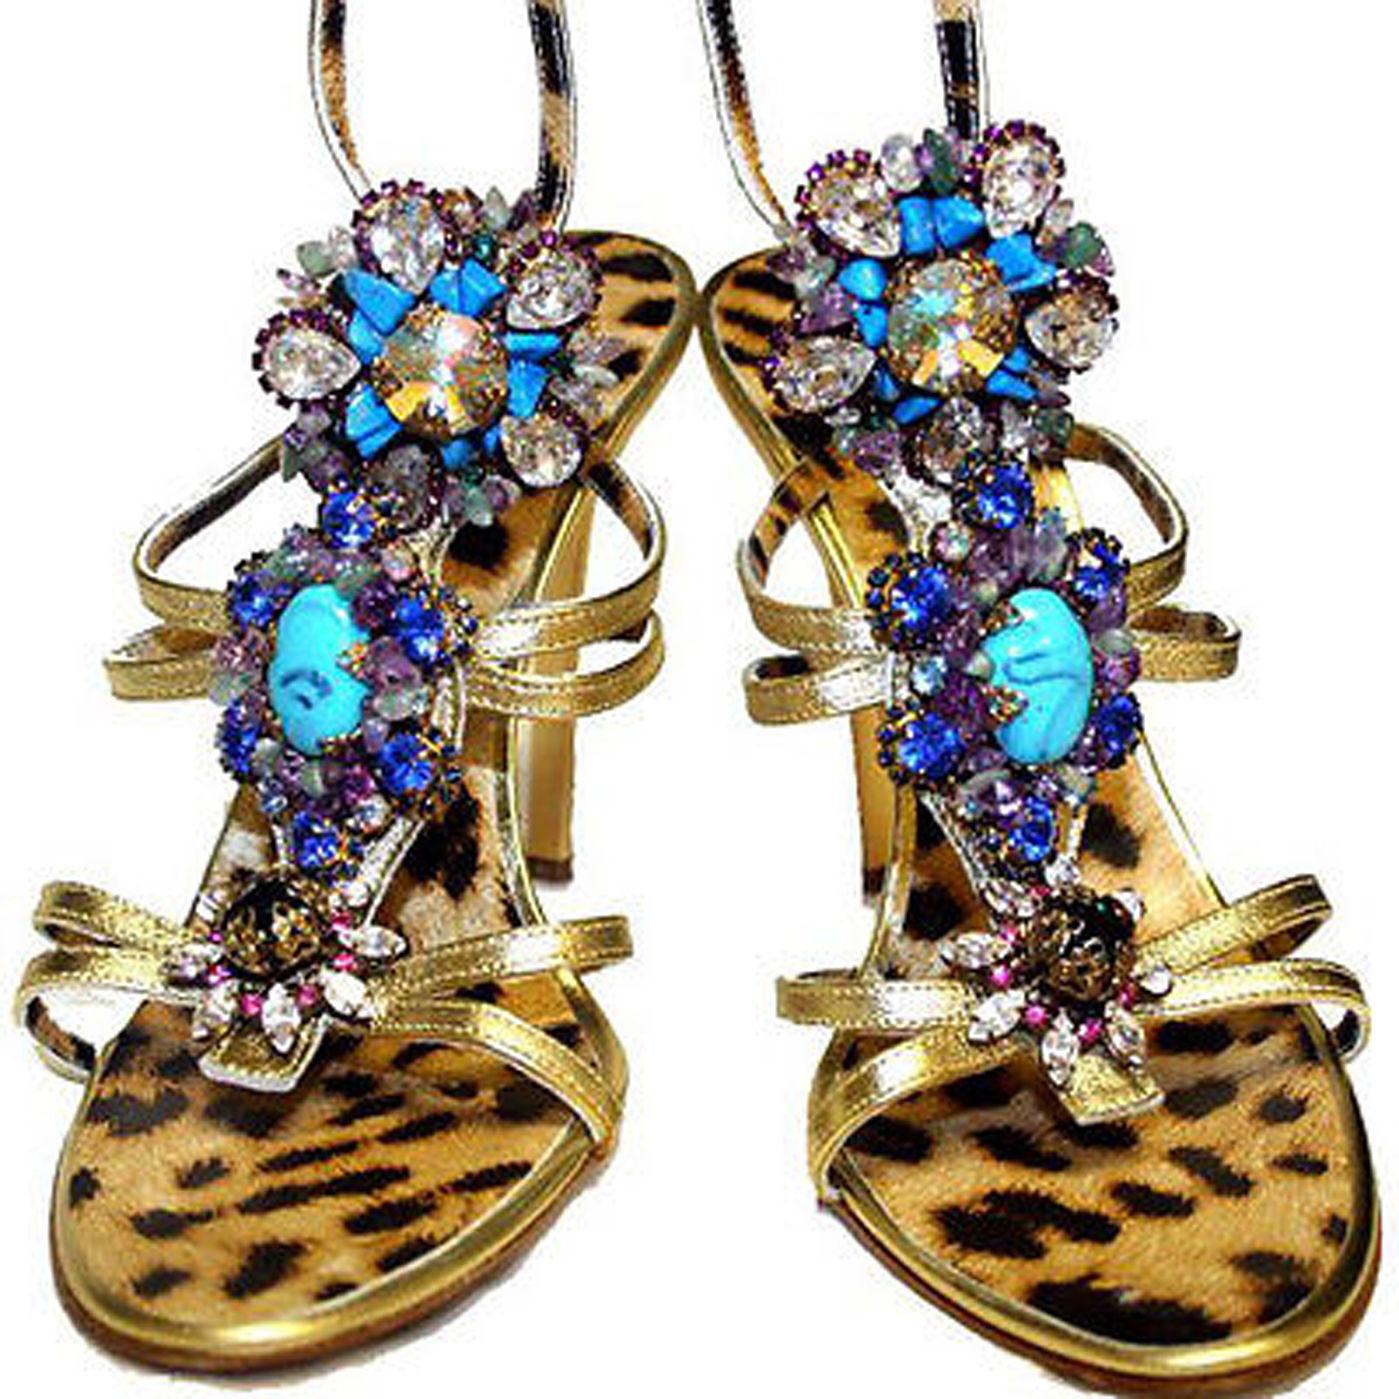 Roberto Cavalli Gold tote Leather Swarovski Crystal Turquoise Embellished schuhe